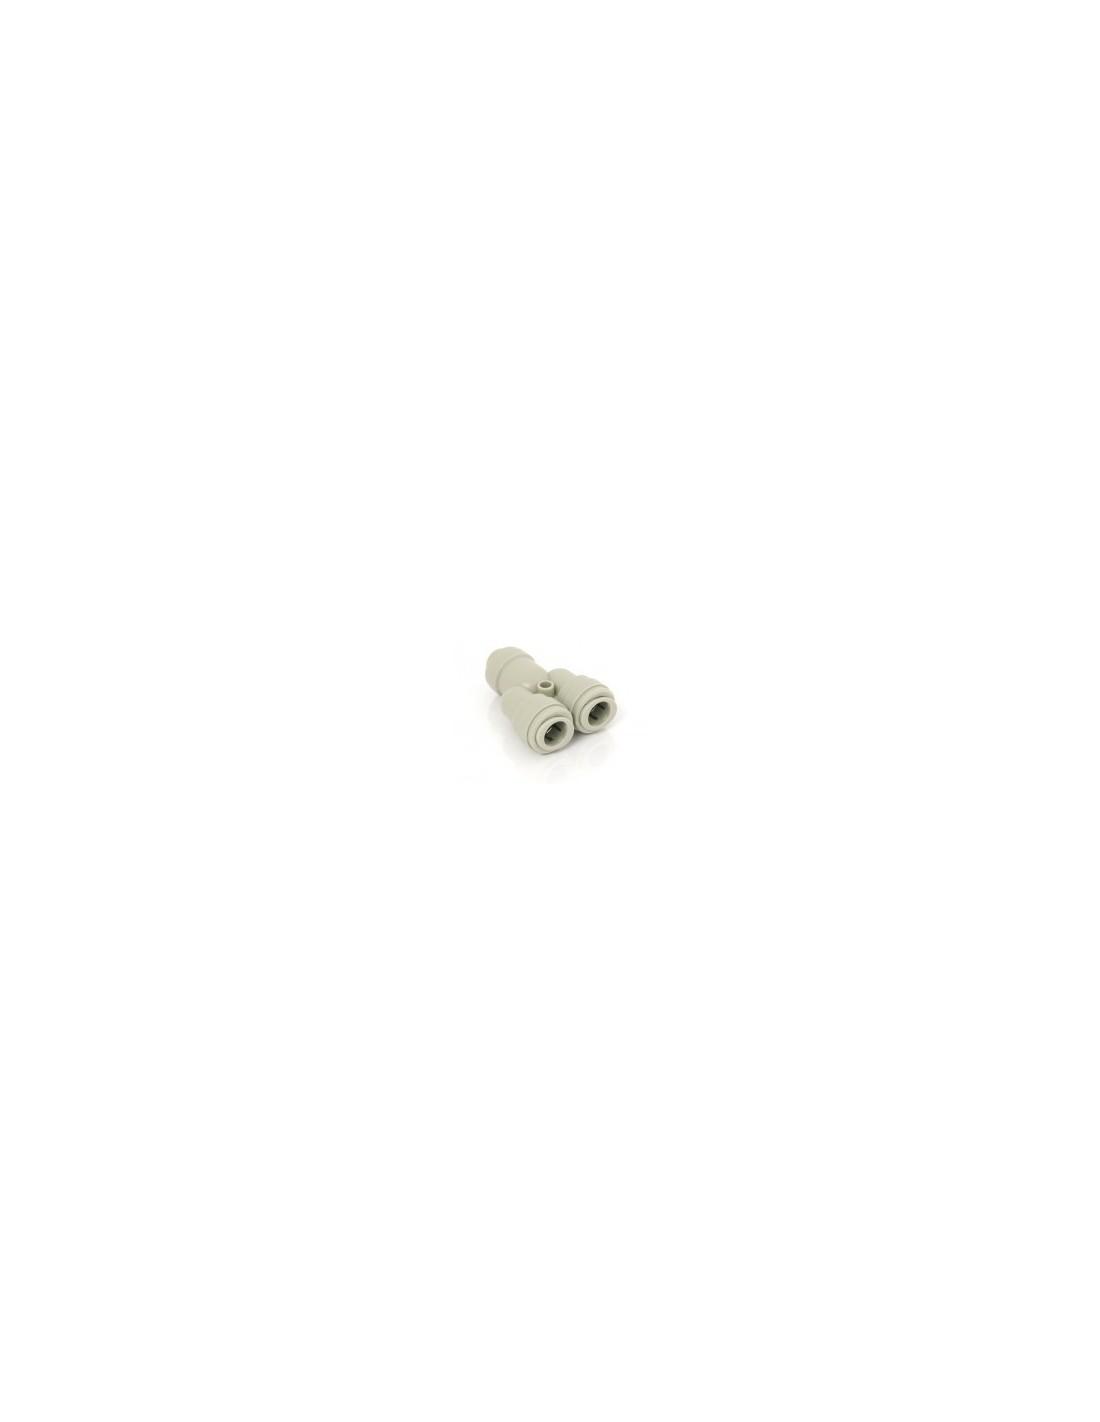 "SPO01270 - DM Y 9.5 x 9.5 x 9.5 mm (3/8"") (ATWD0606)"